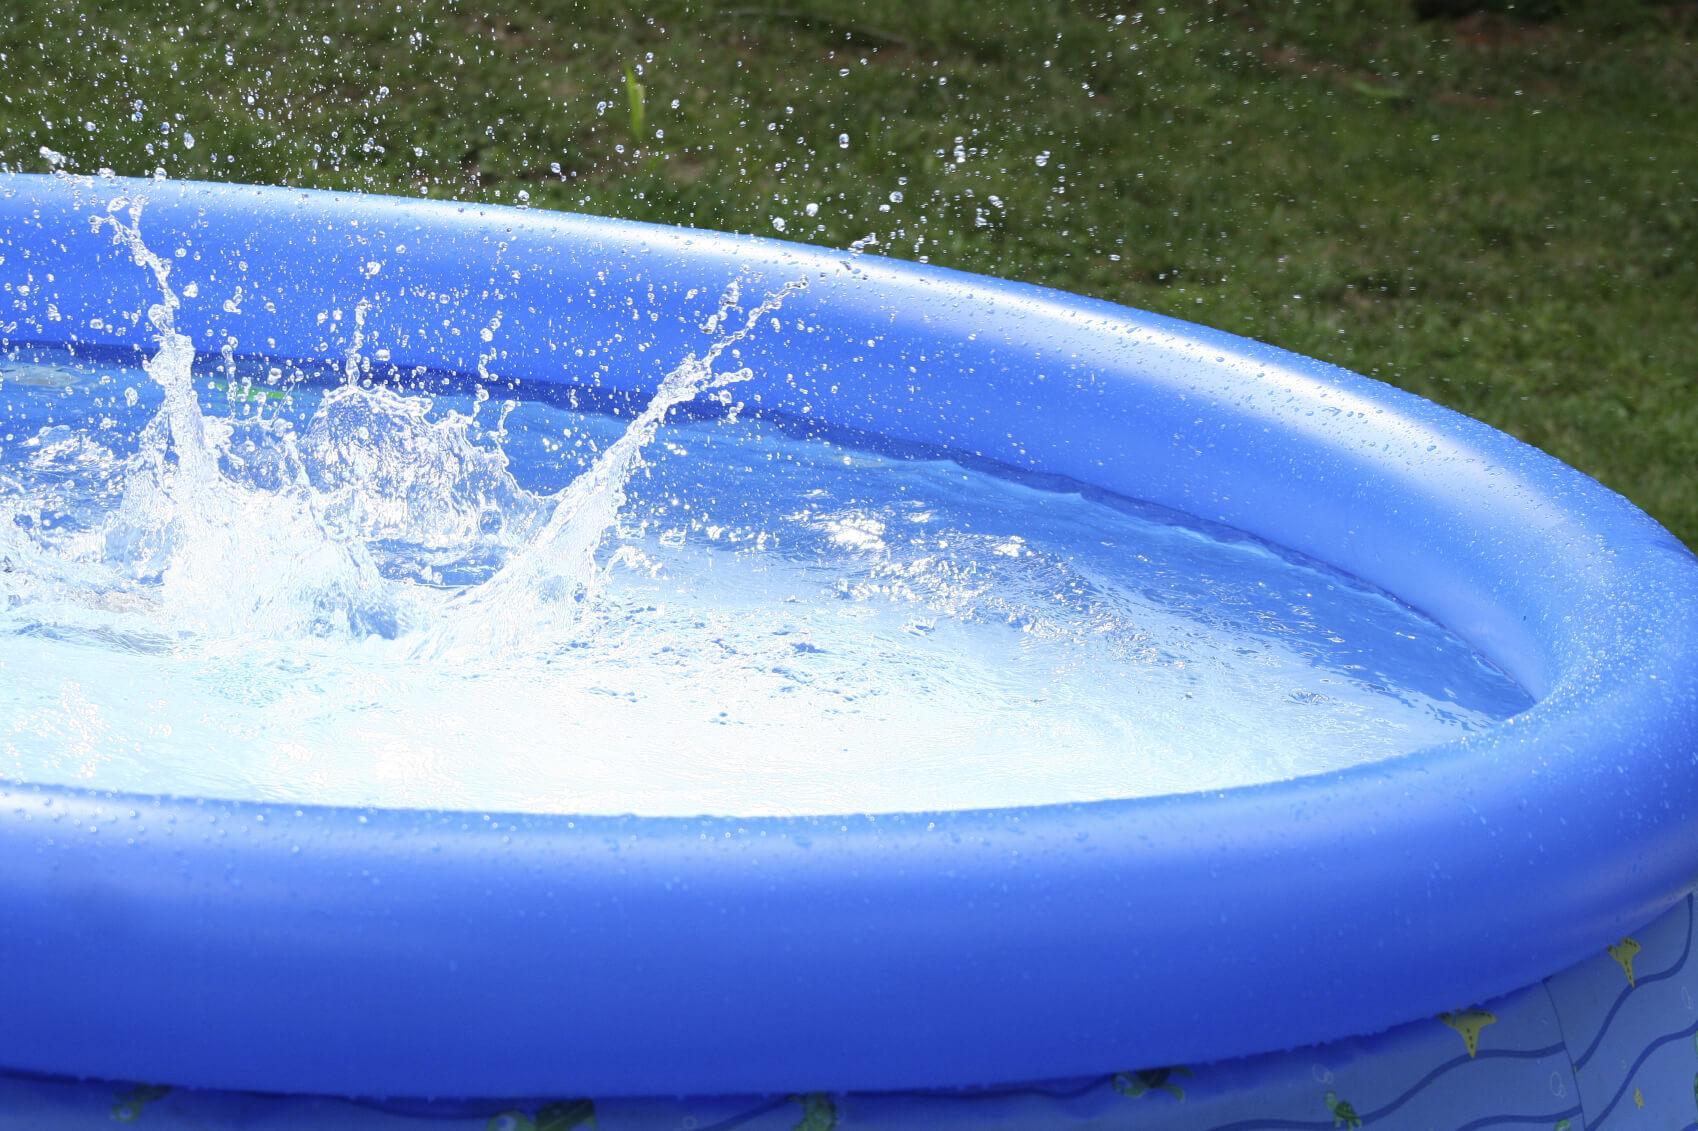 inflate pool 18